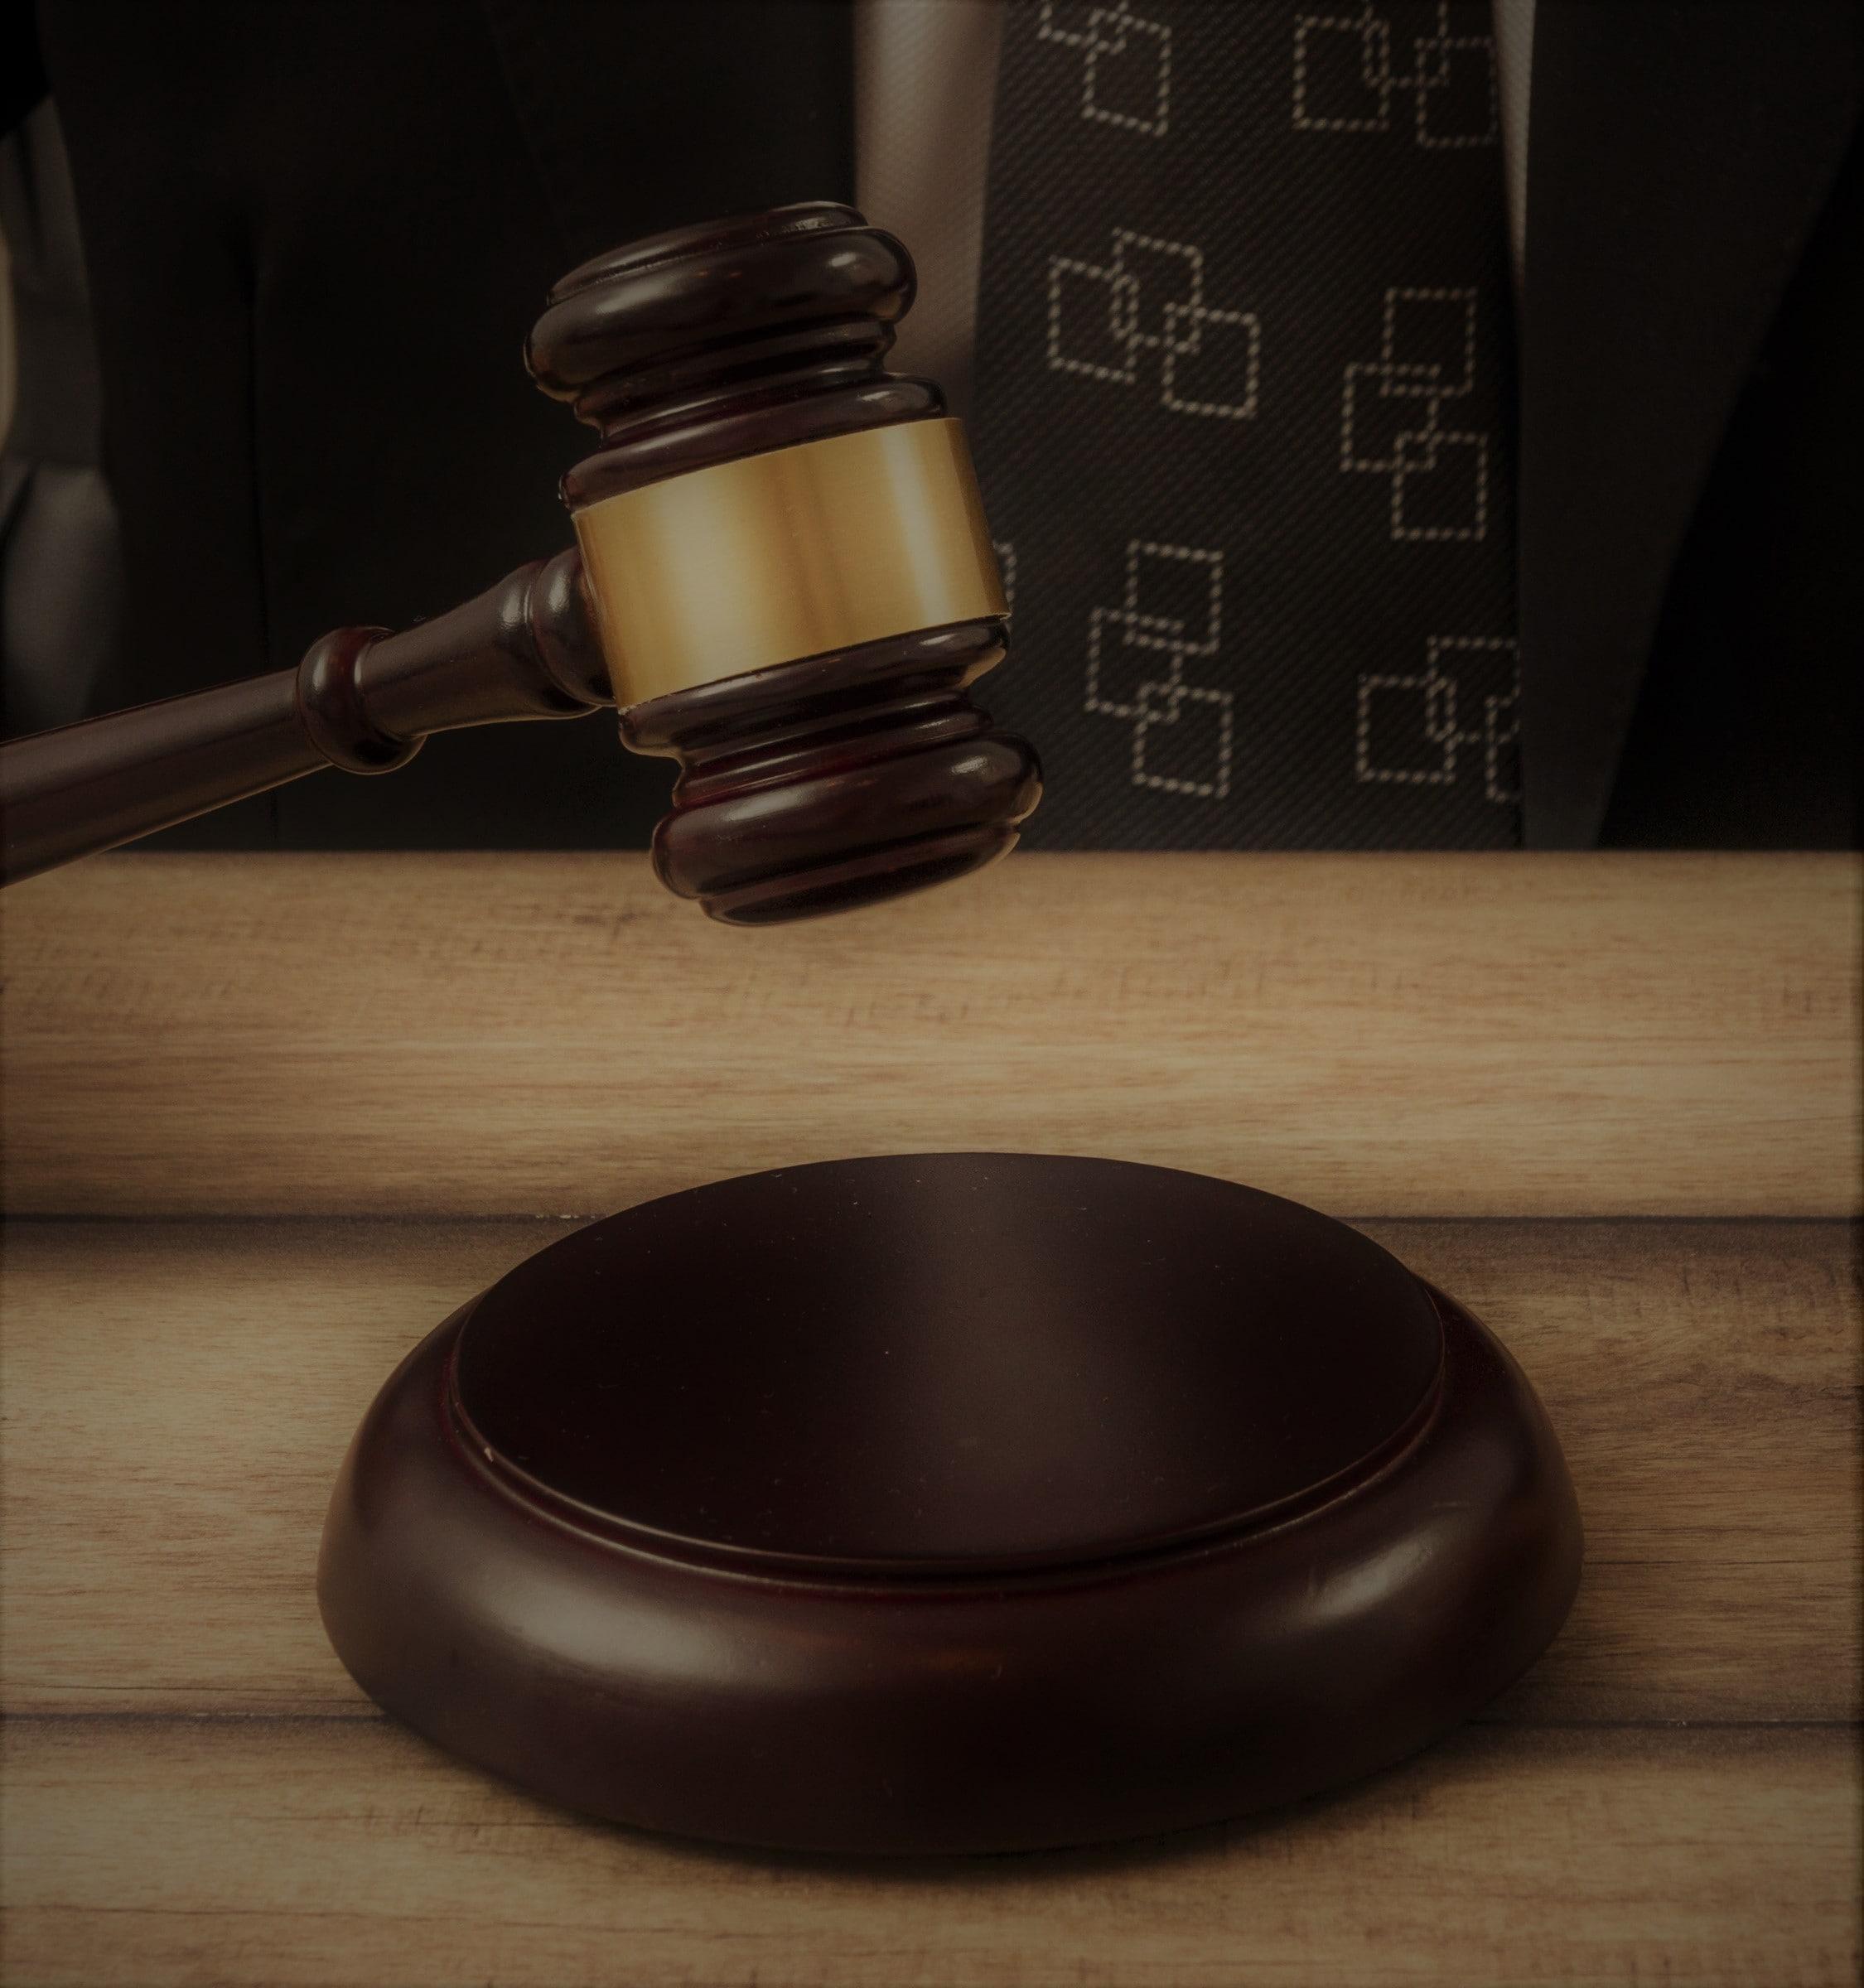 lawyer-with-gavel-hammer-min.jpg